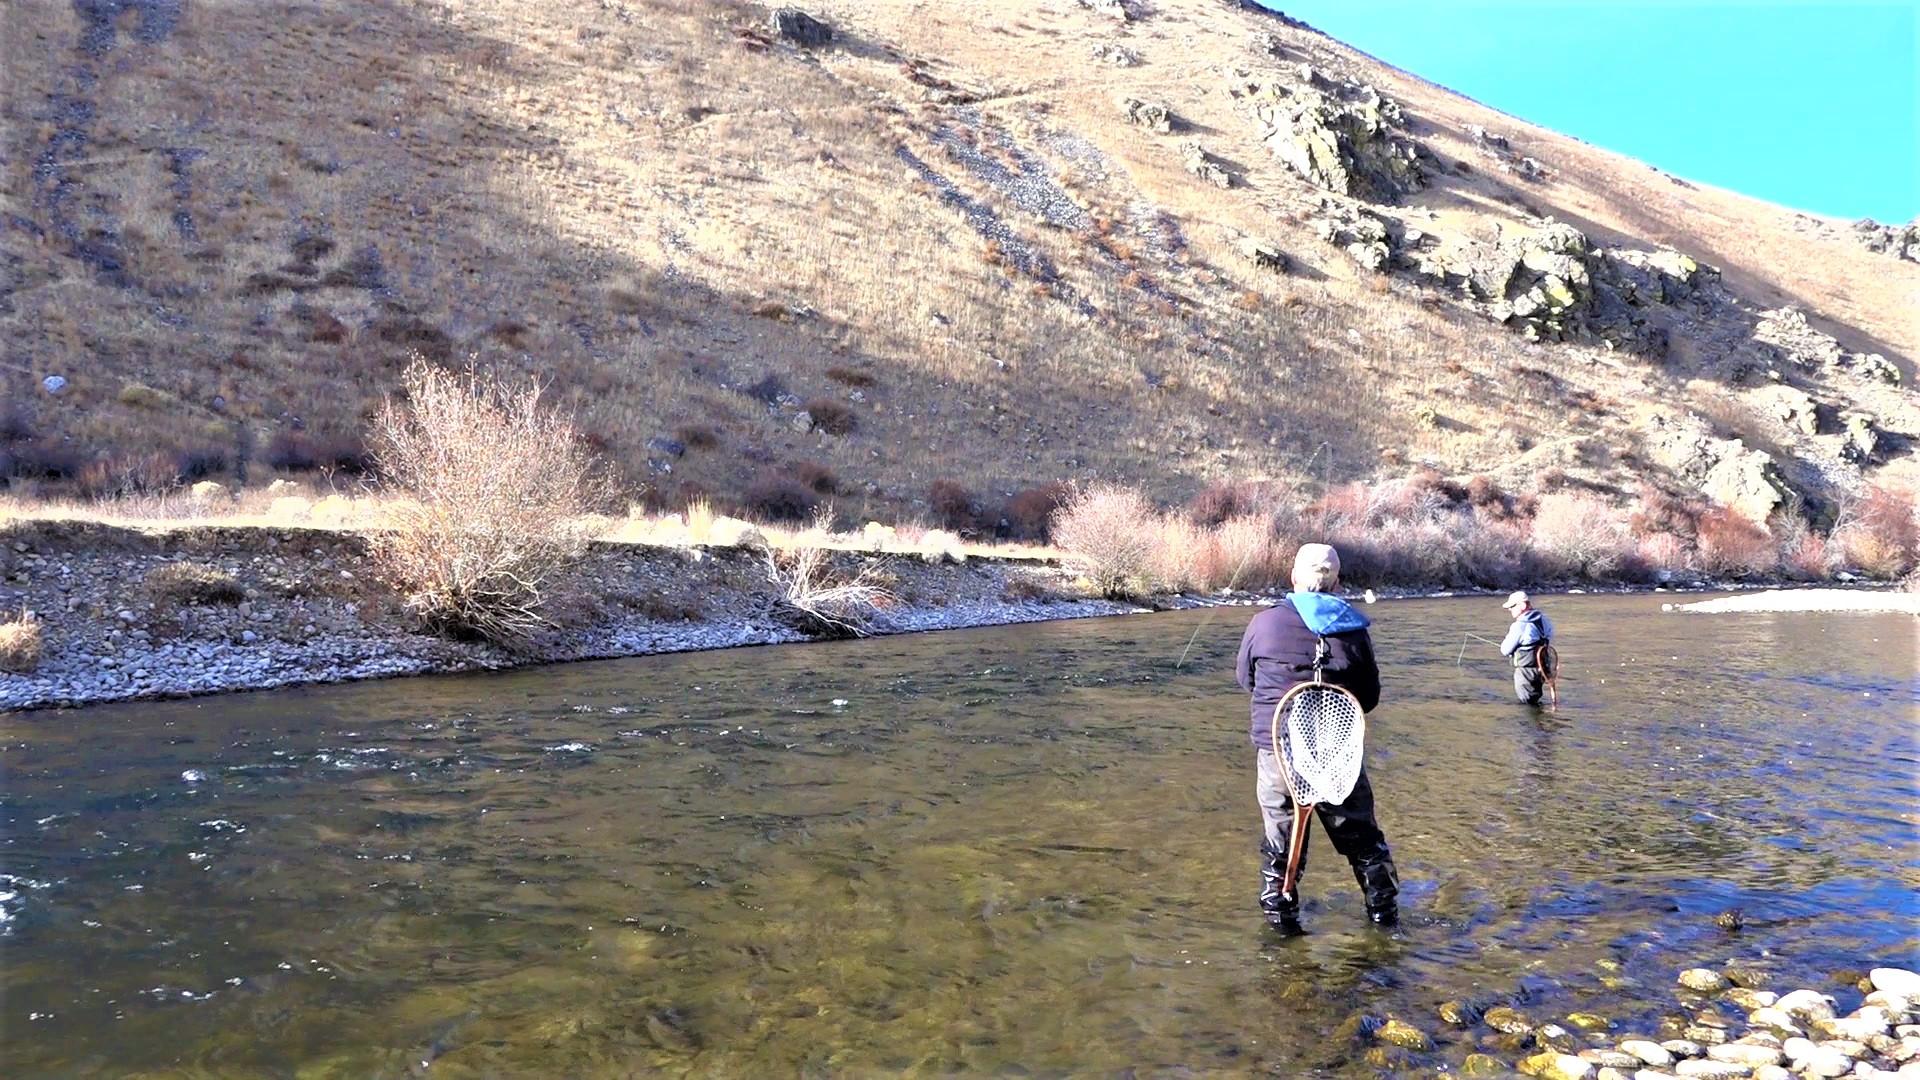 Fly Fishing Idaho South Fork Boise River